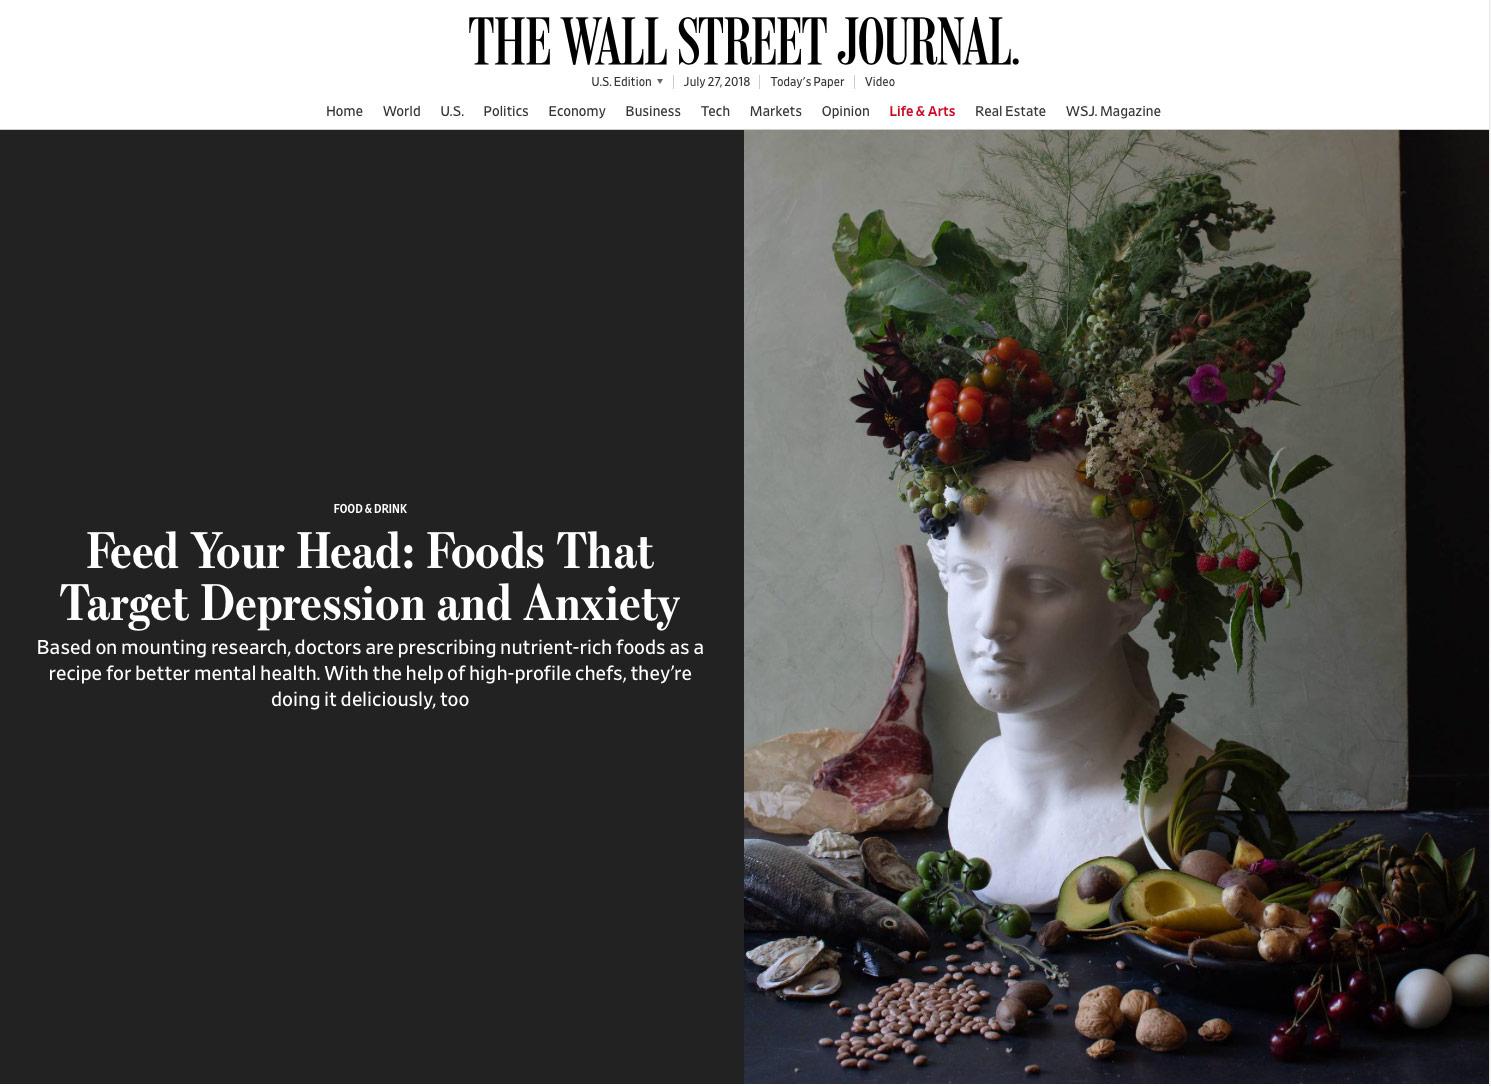 Wall Street Journal Press Clip RE: David Bouley, Dr. Uma Naidoo and Dr. Drew Ramsey